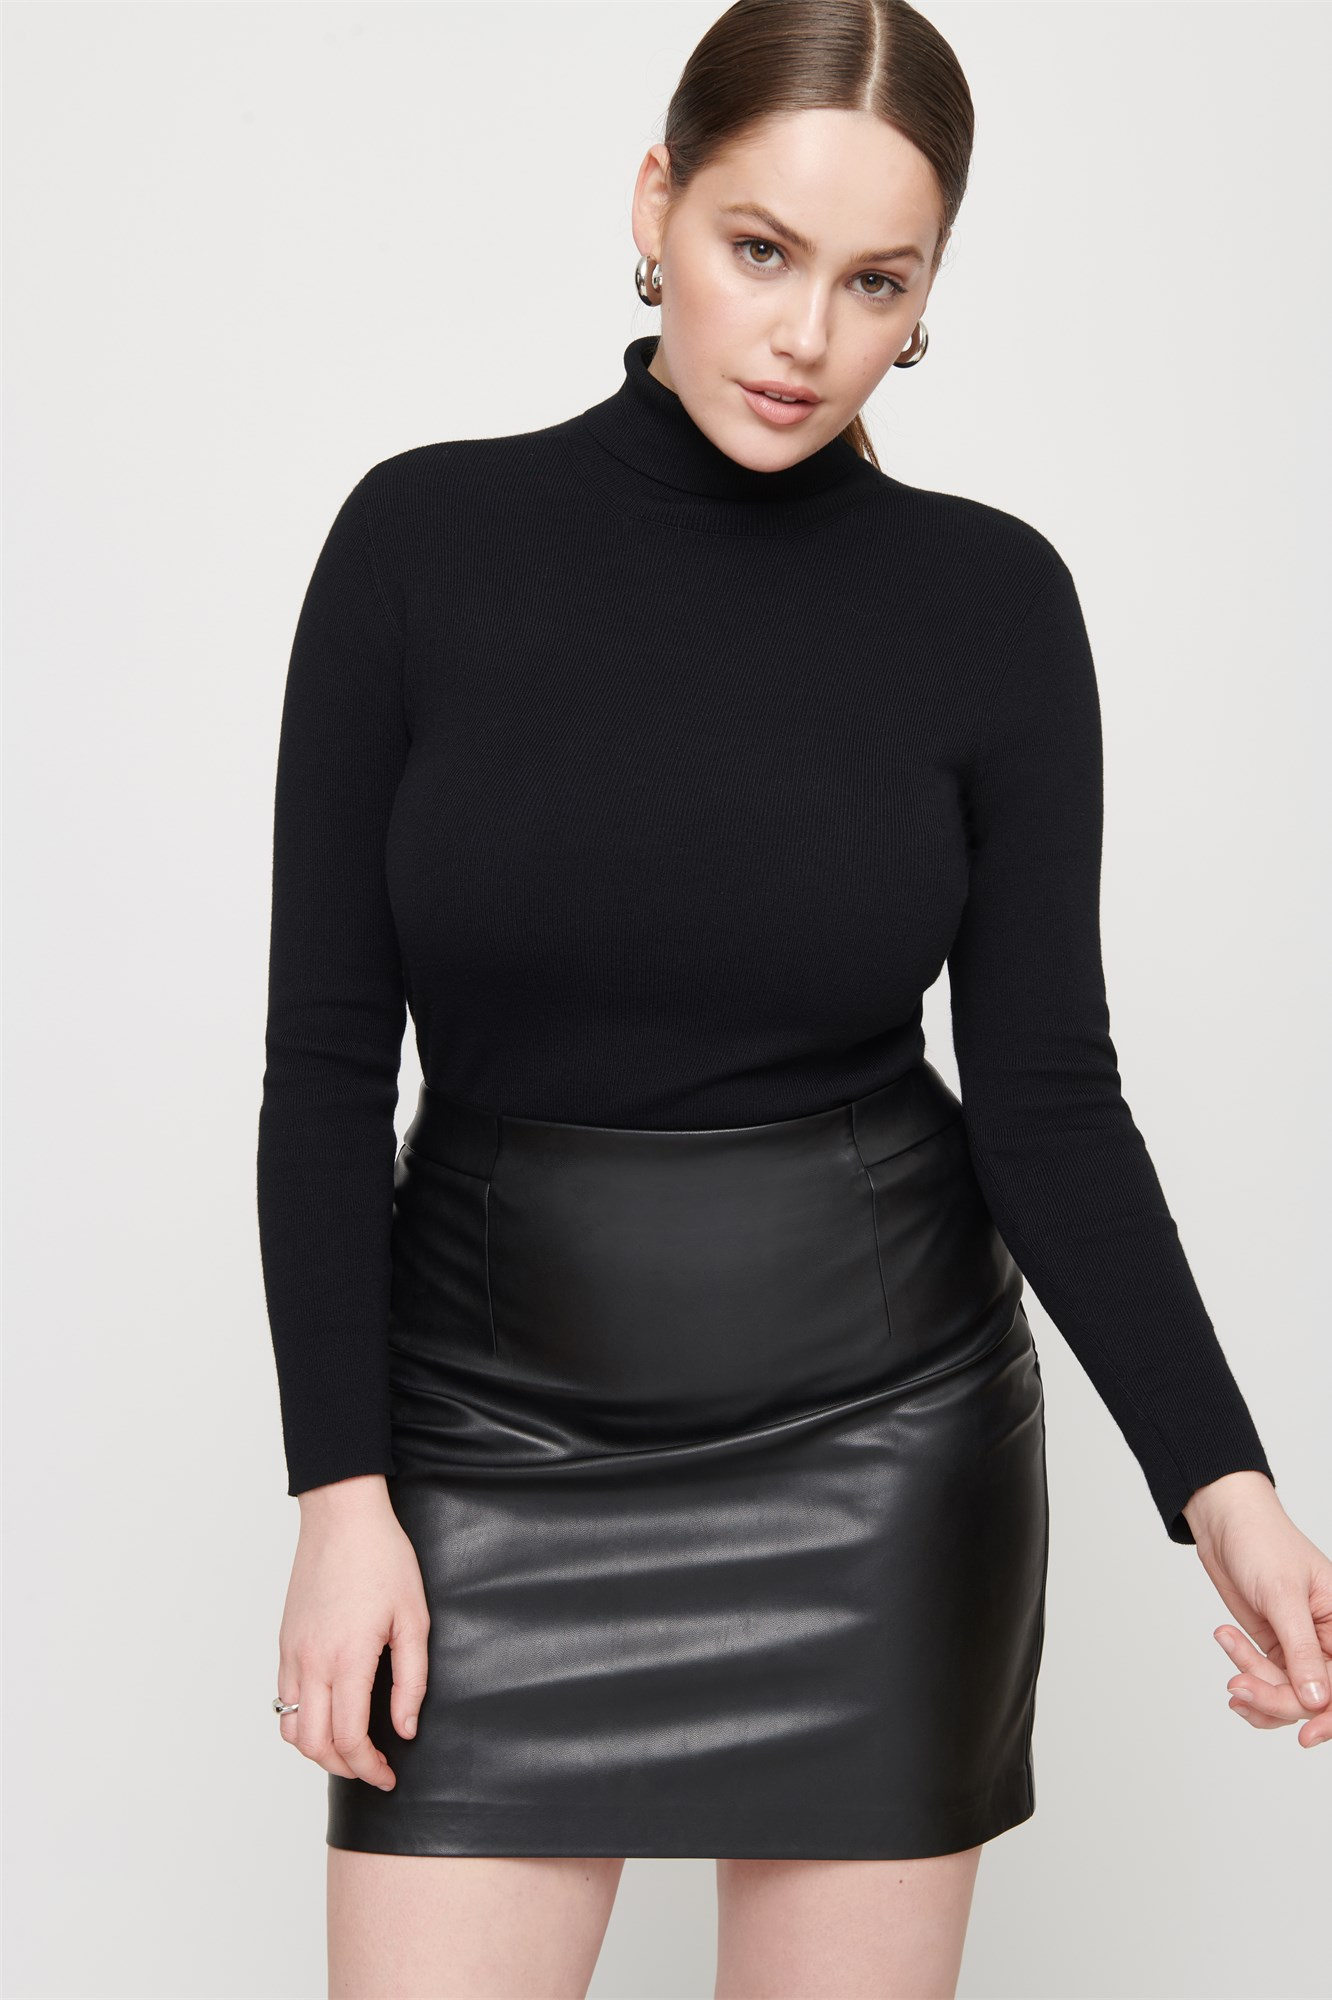 6d9f6d06e image image image image. High Rise Faux Leather Skirt